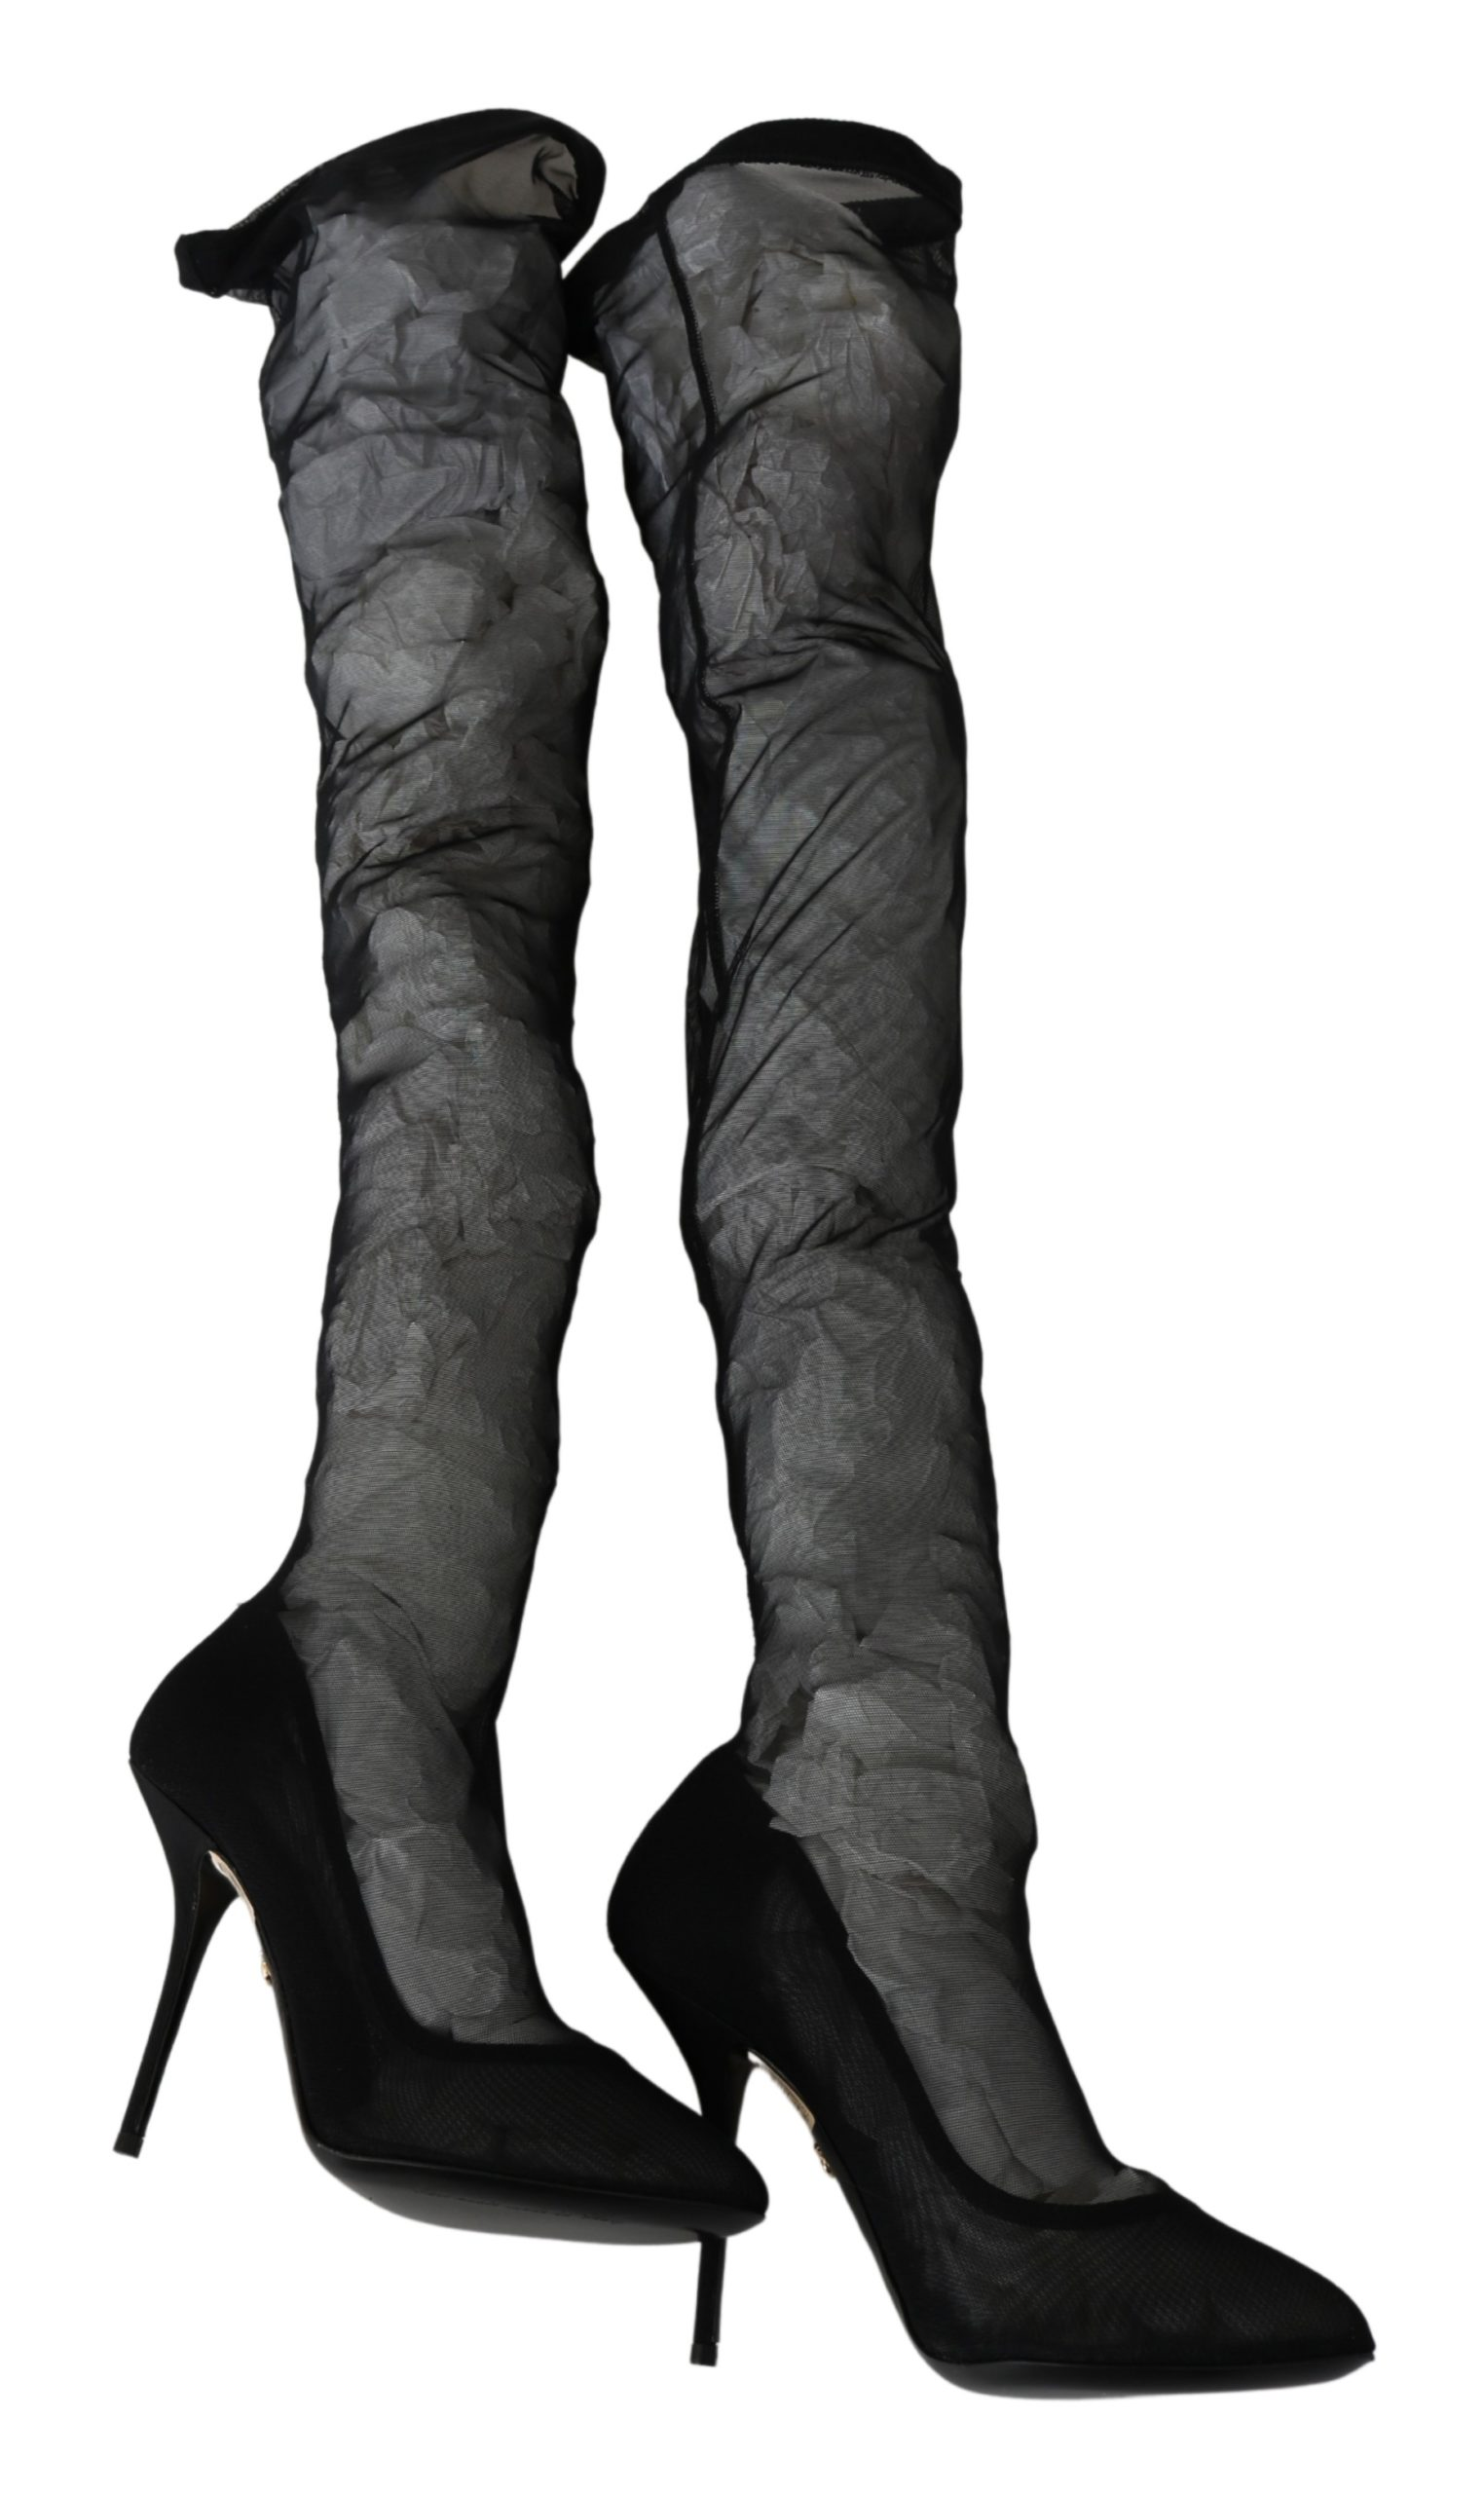 Dolce & Gabbana Women's Tulle Stretch Knee Boots Black LA6917 - EU37/US6.5